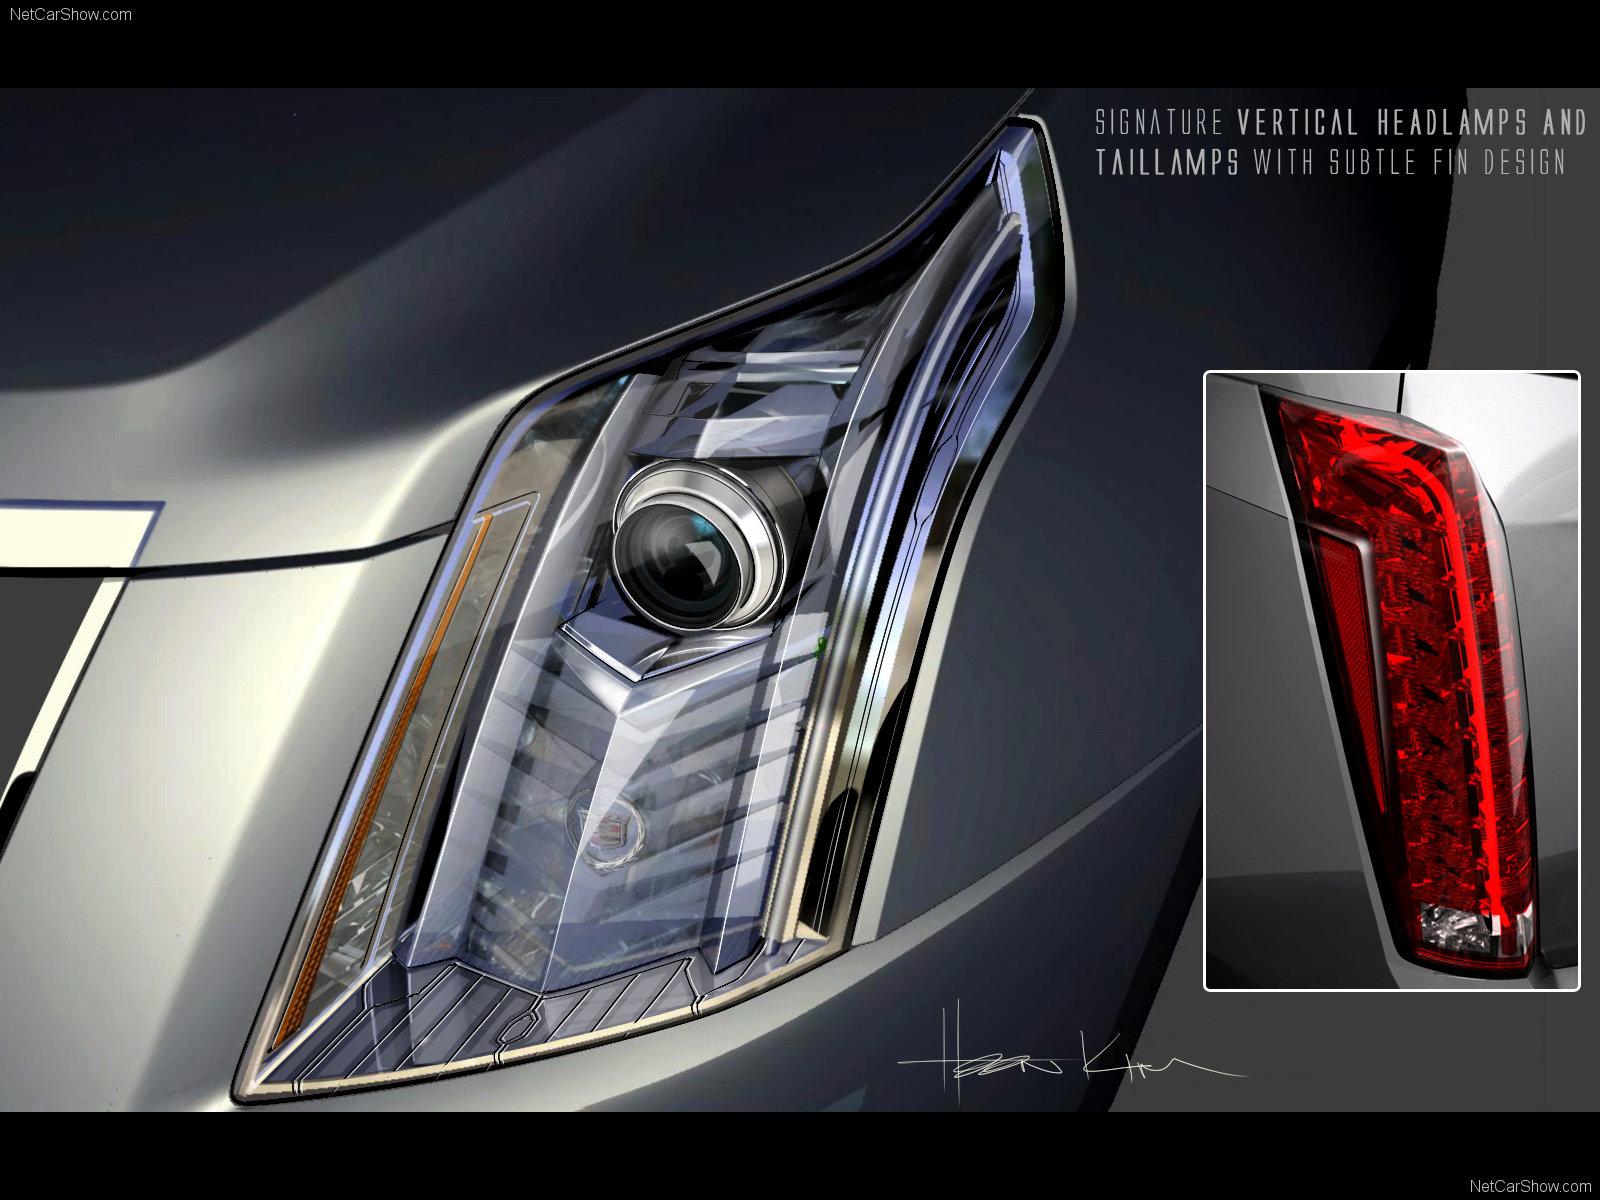 CarConvos: 2013 Cadillac SRX